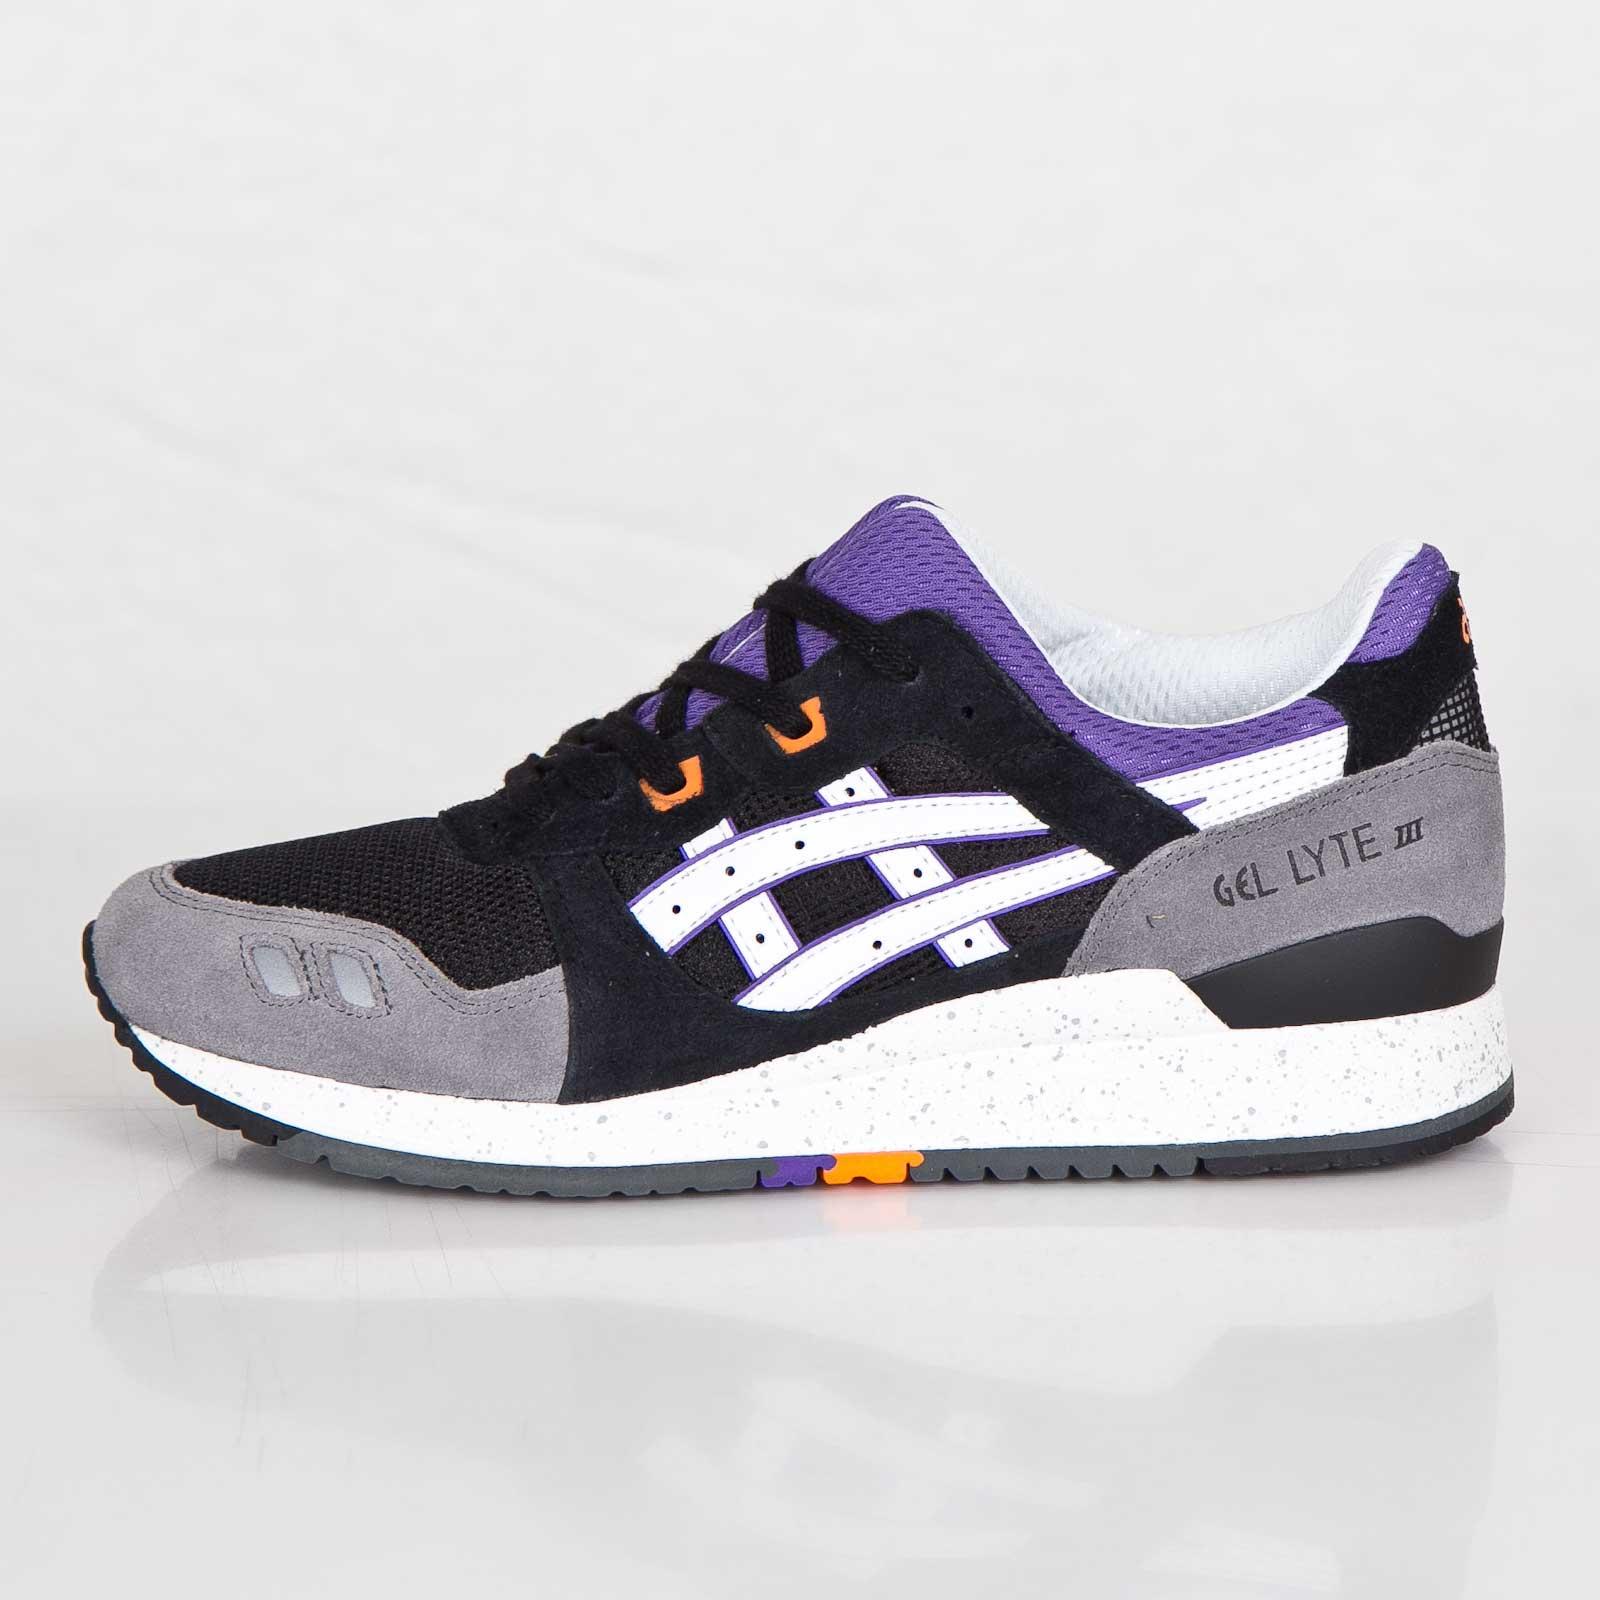 H425n Sneakersnstuff Gel Iii 9001 I Lyte Asics Tiger Sneakers kXZPOiu